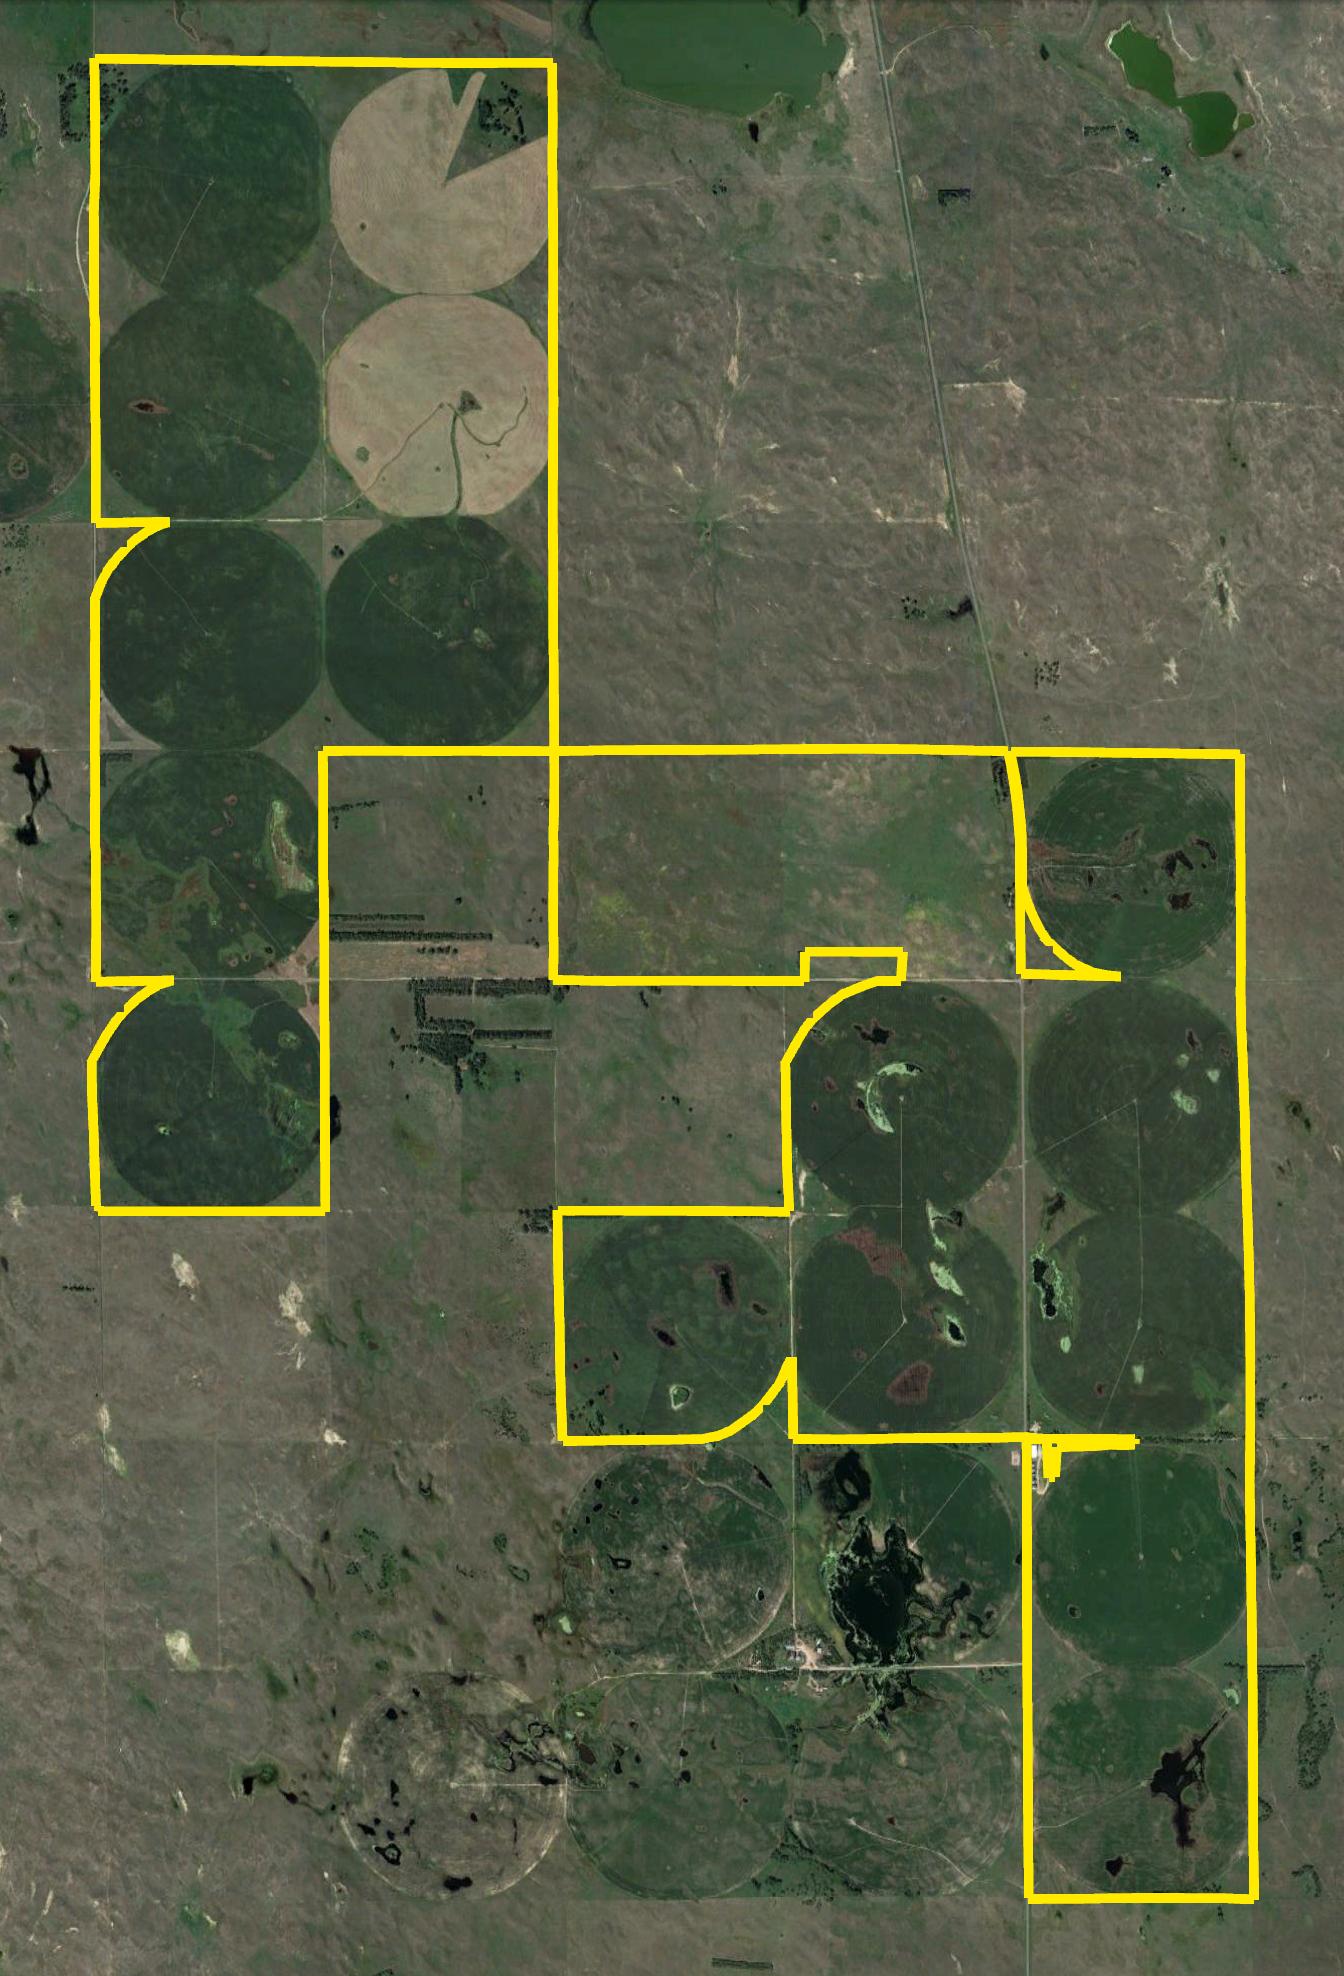 Farm Credit_BIR-1058_GoogleEarthPro_Aerial.2